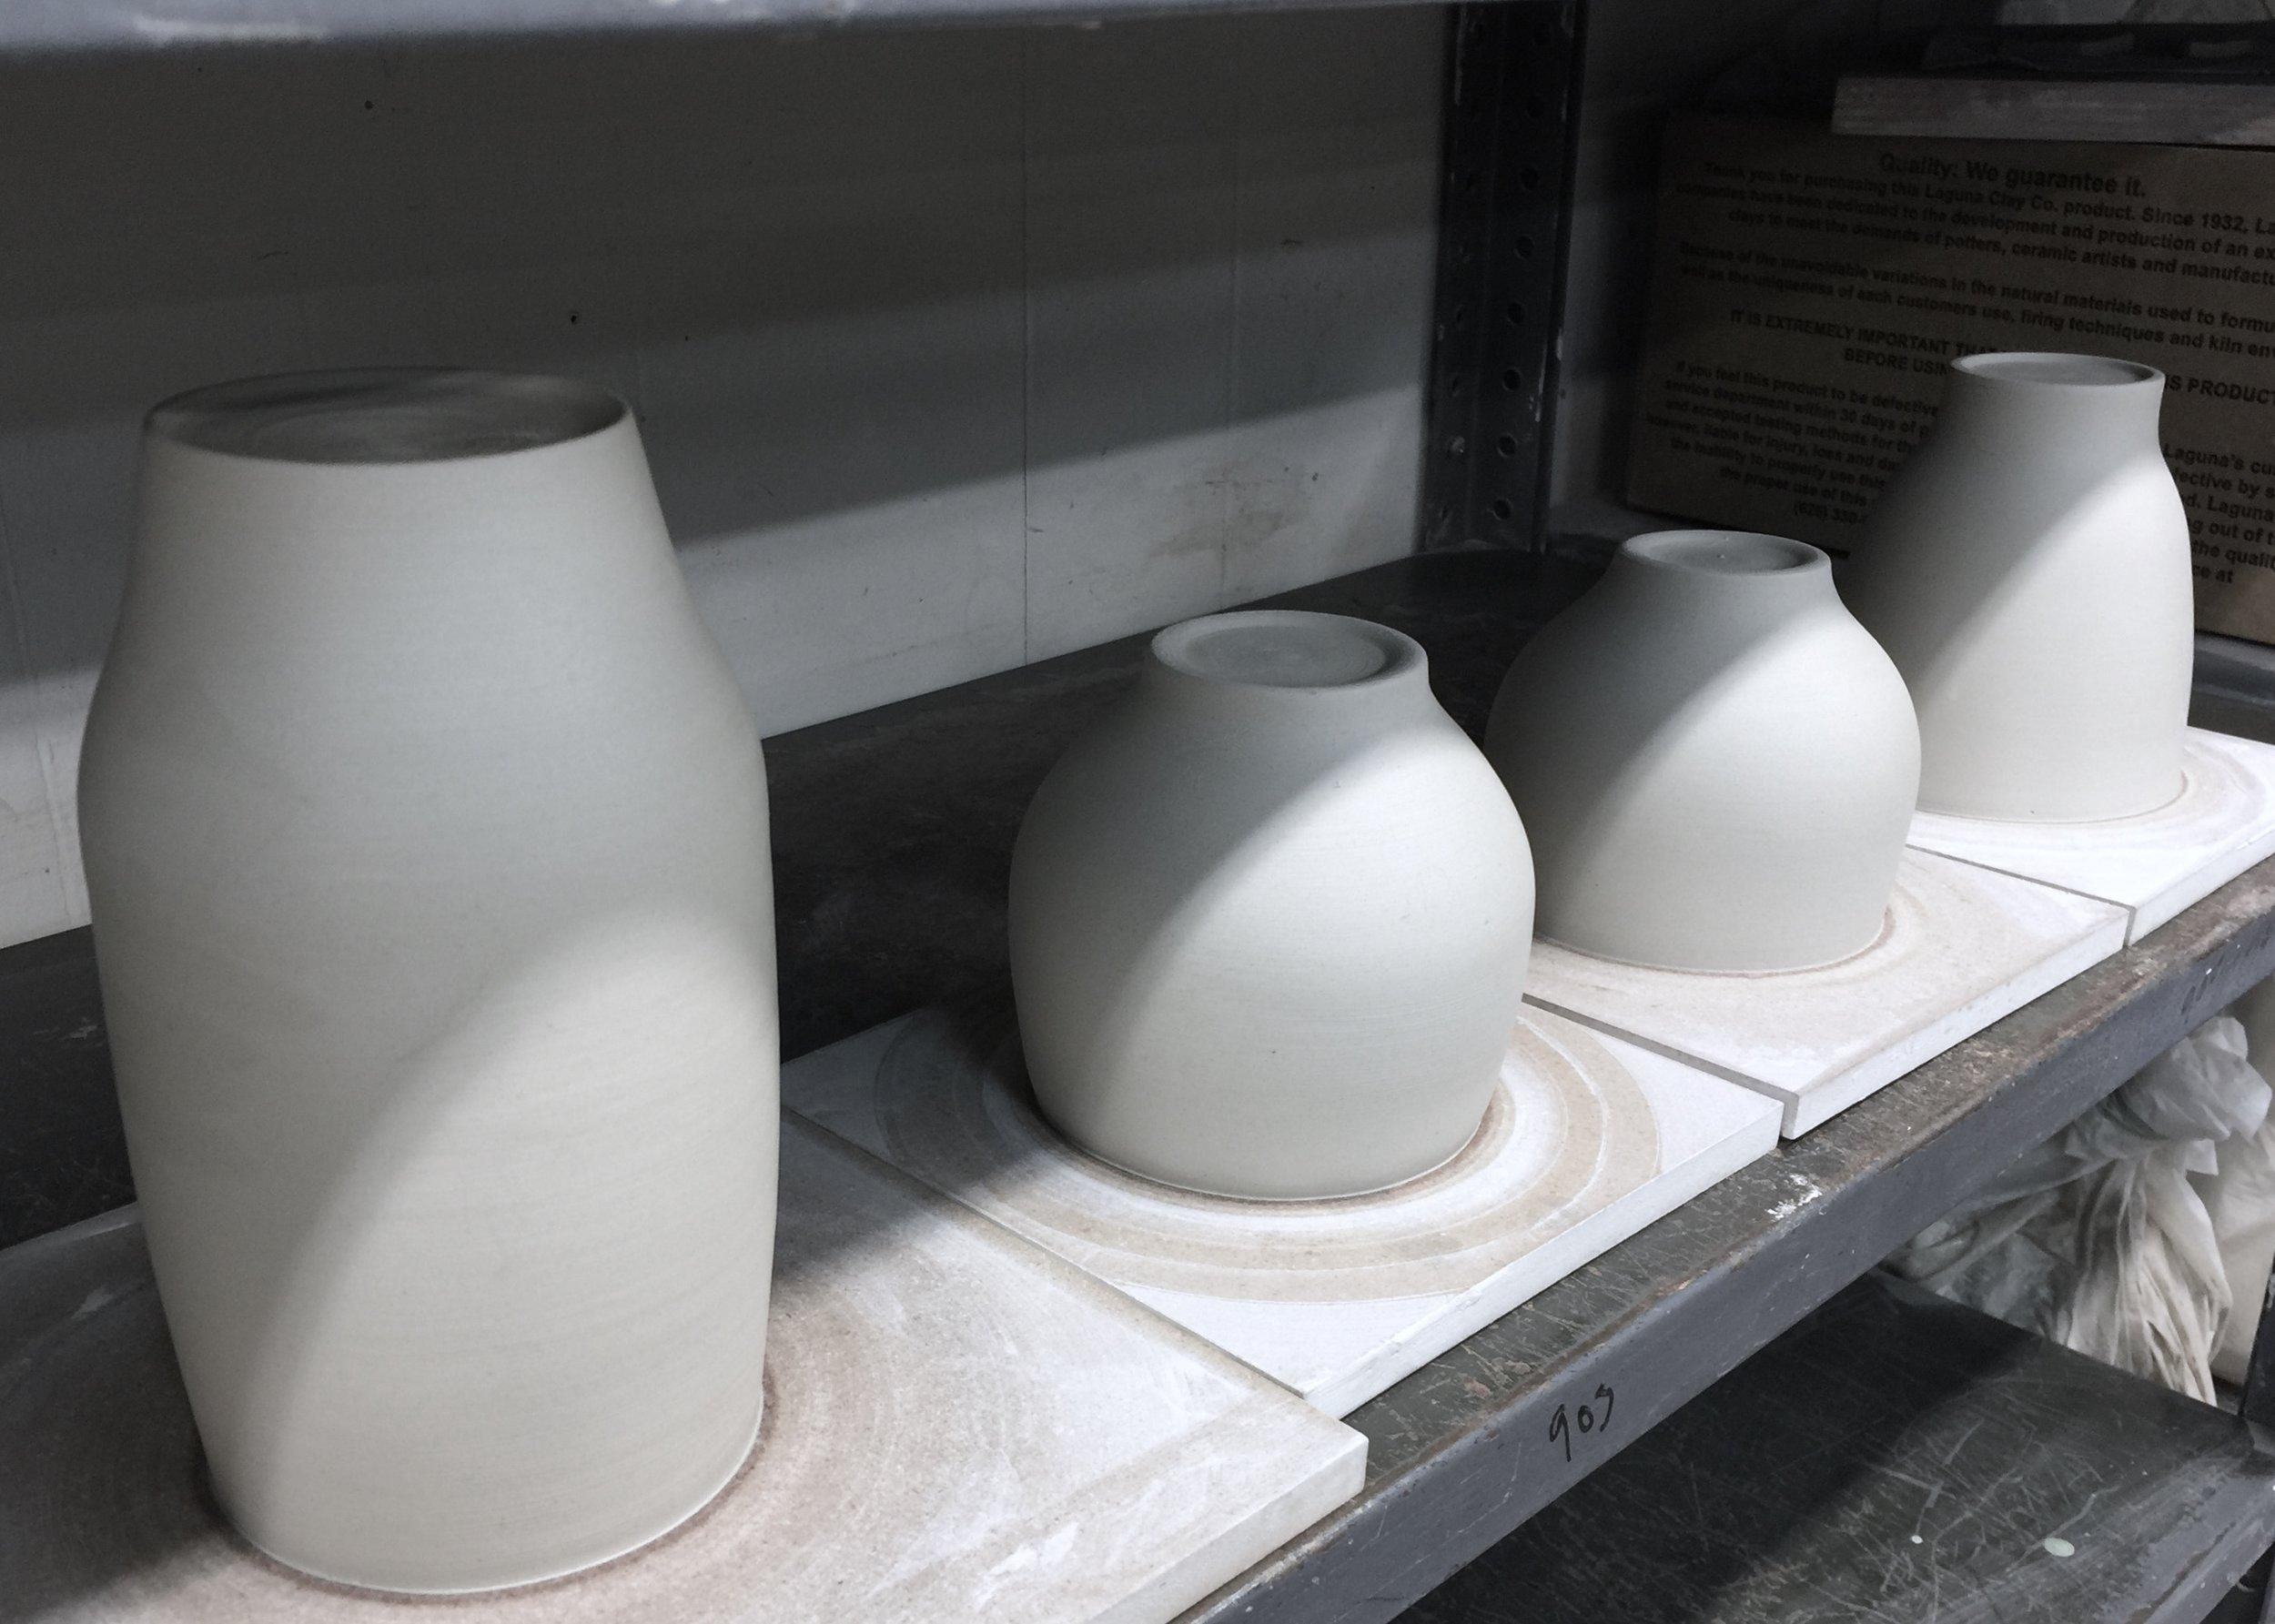 wheel thrown ceramic porcelain cup forms for slip-casting plaster molds